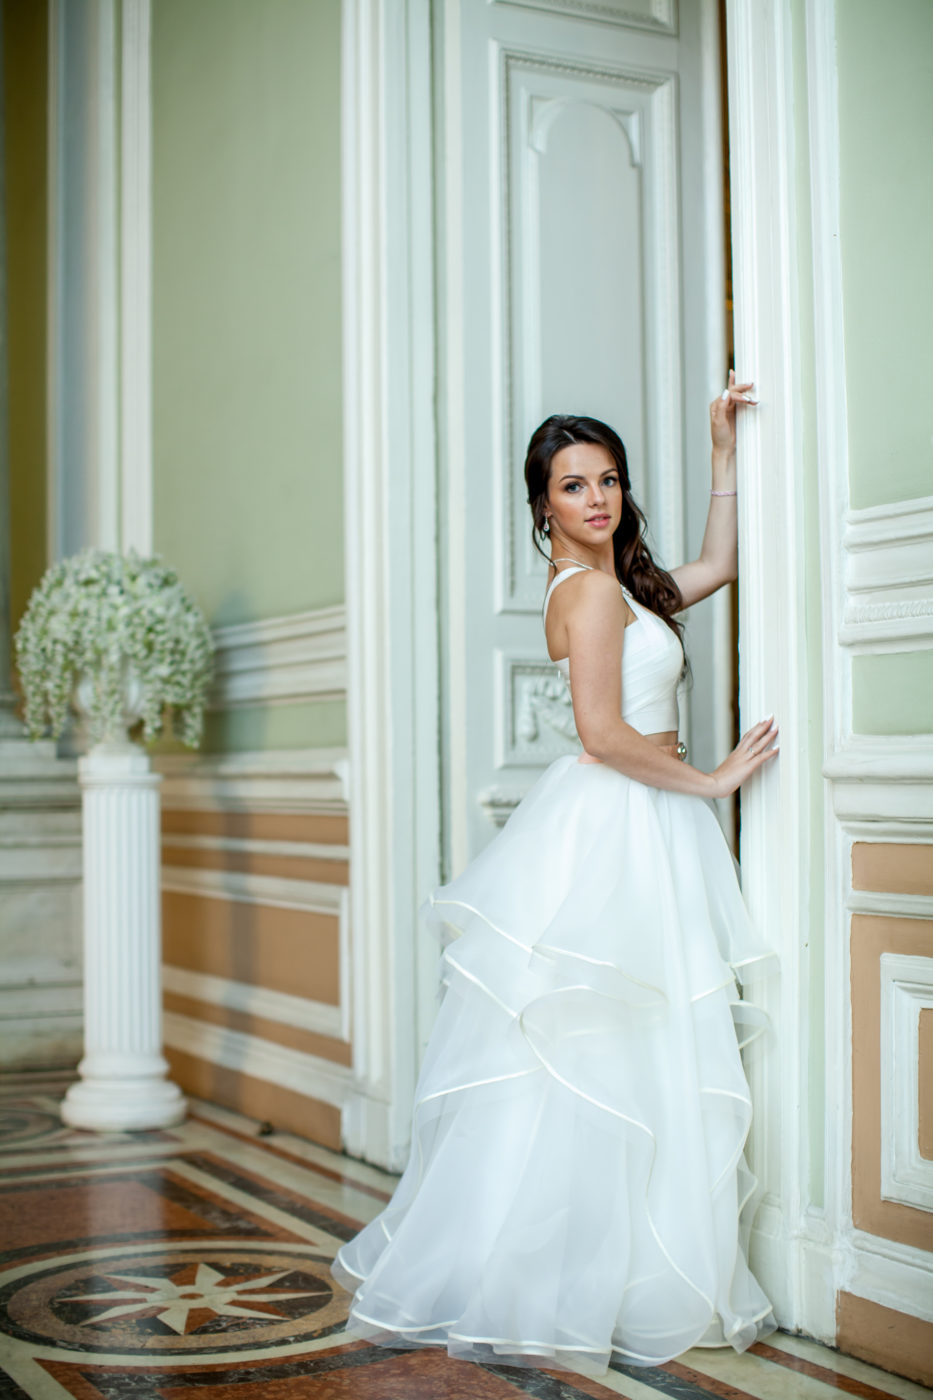 Дворец бракосочетания № 1